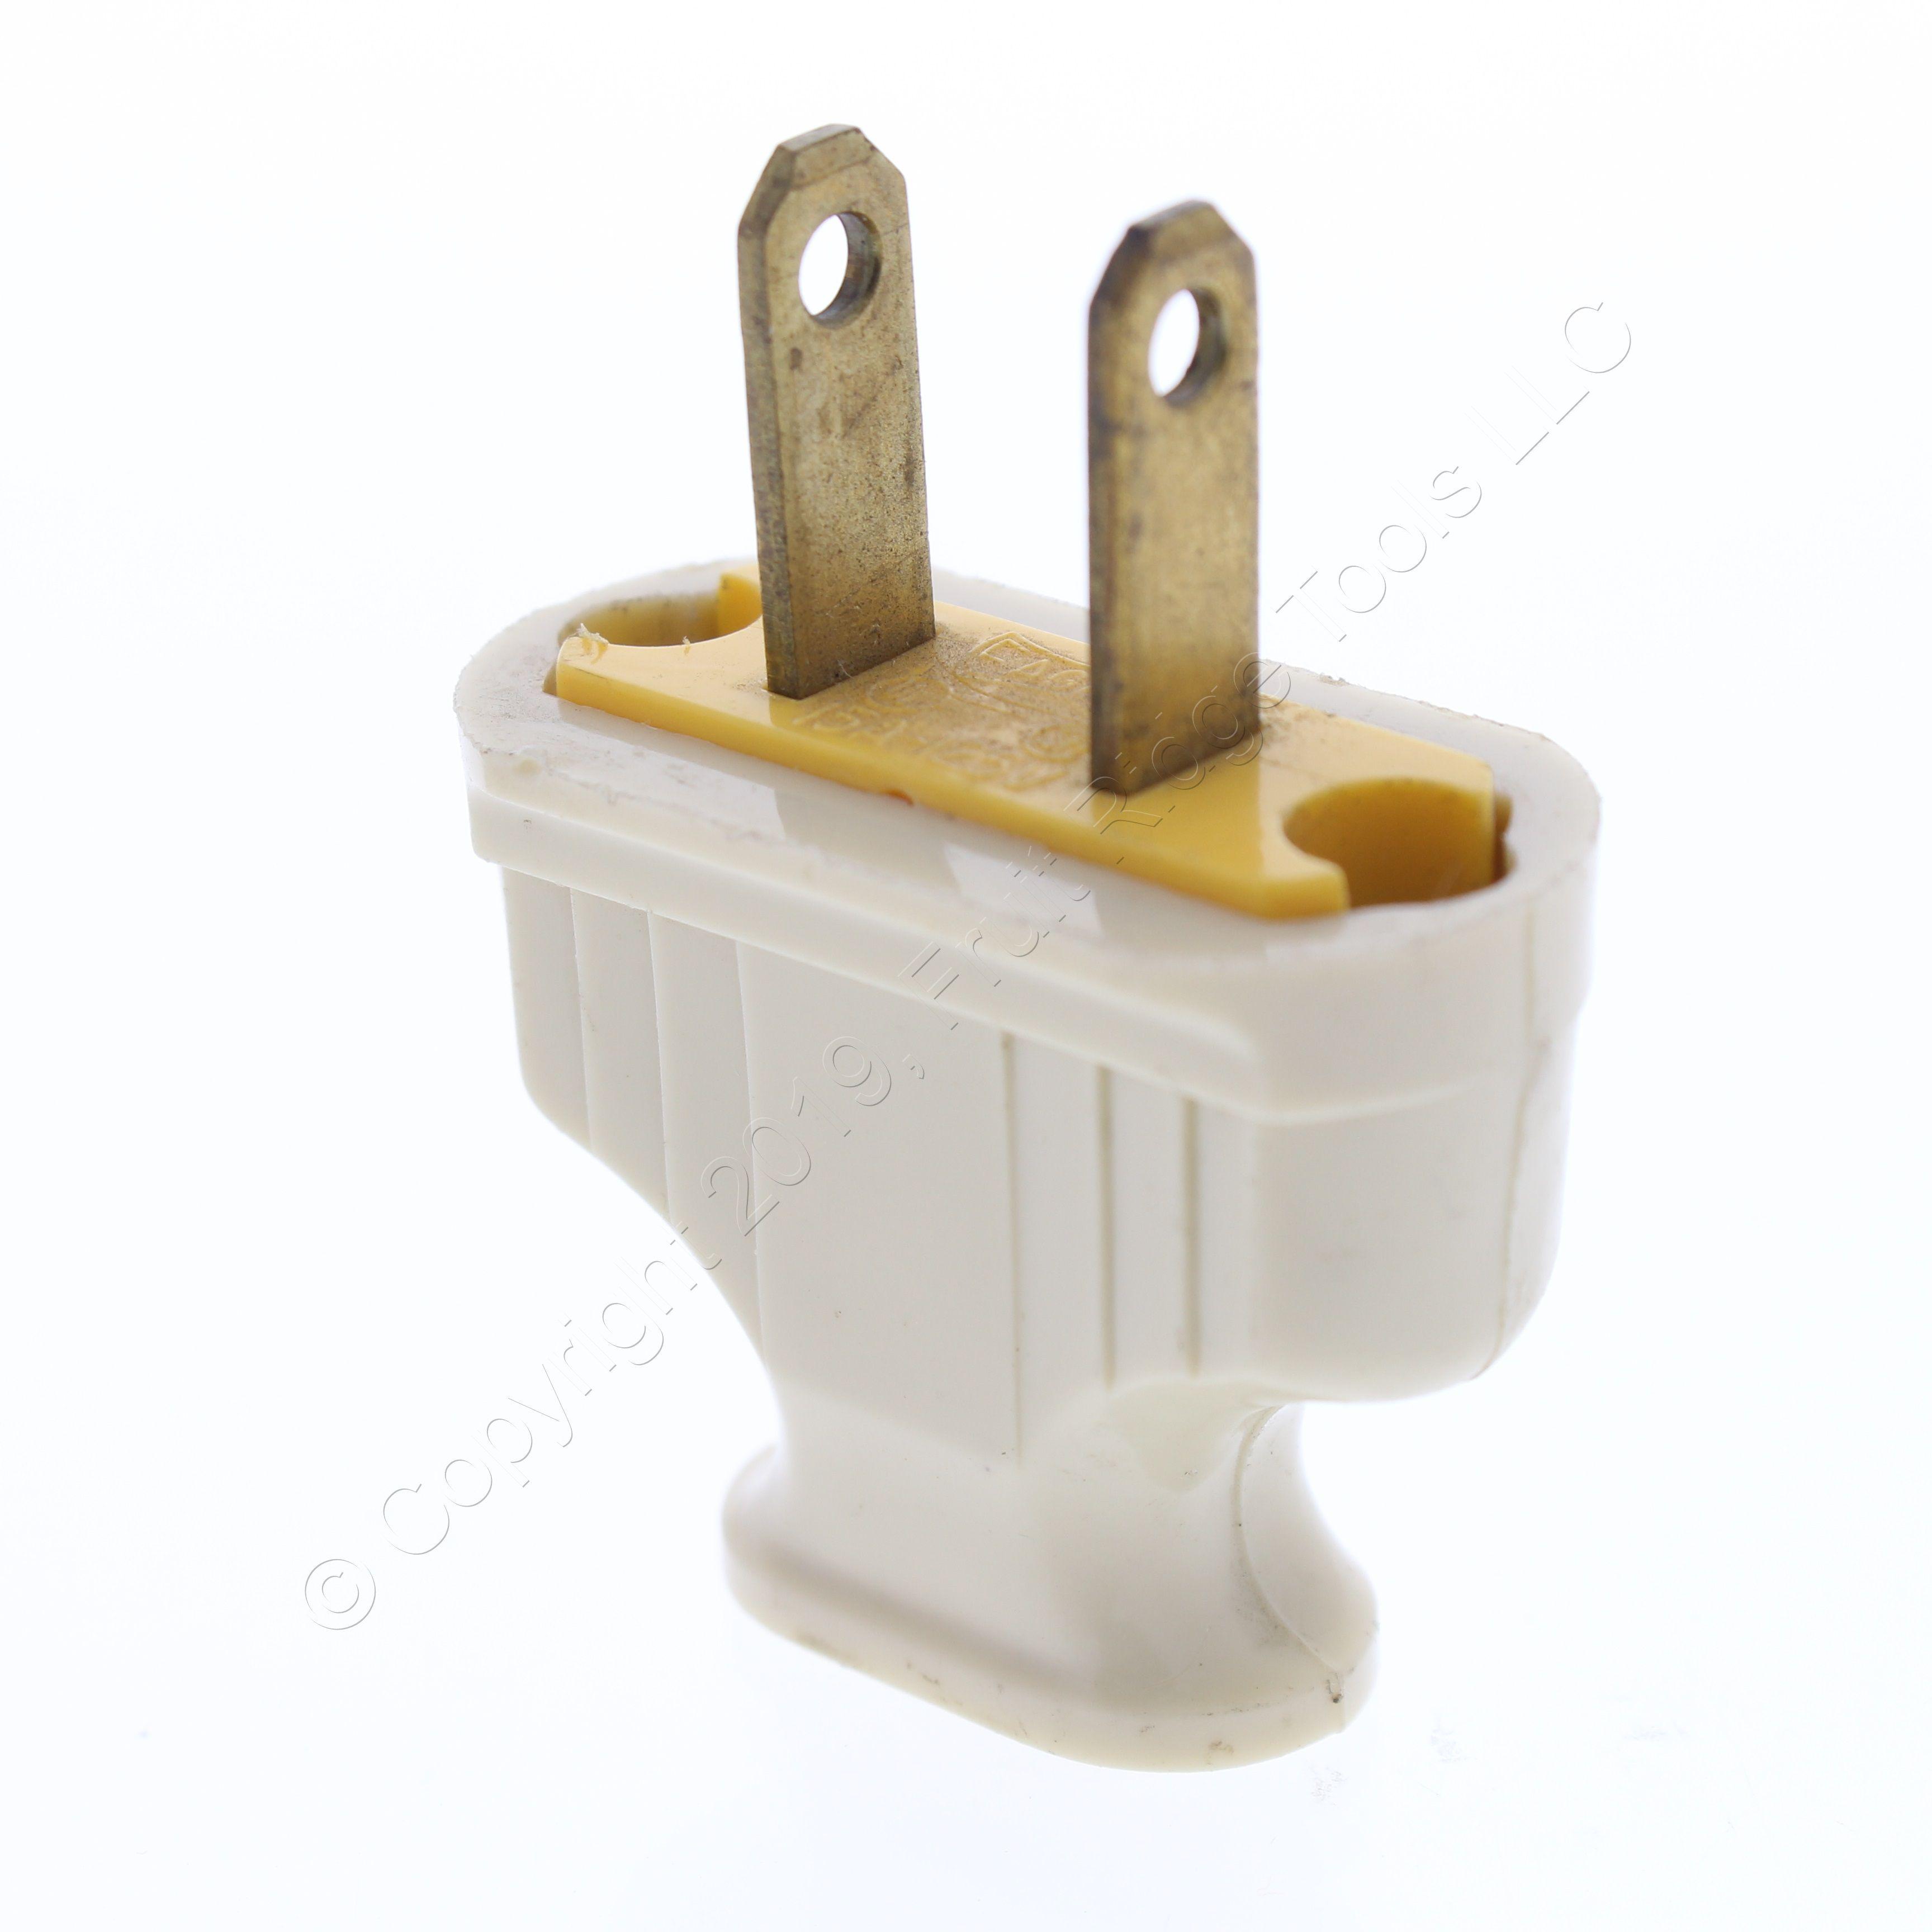 Cooper Brown Residential Non-Polarized Plug Cord End 15A 125V NEMA 1-15P 1912B